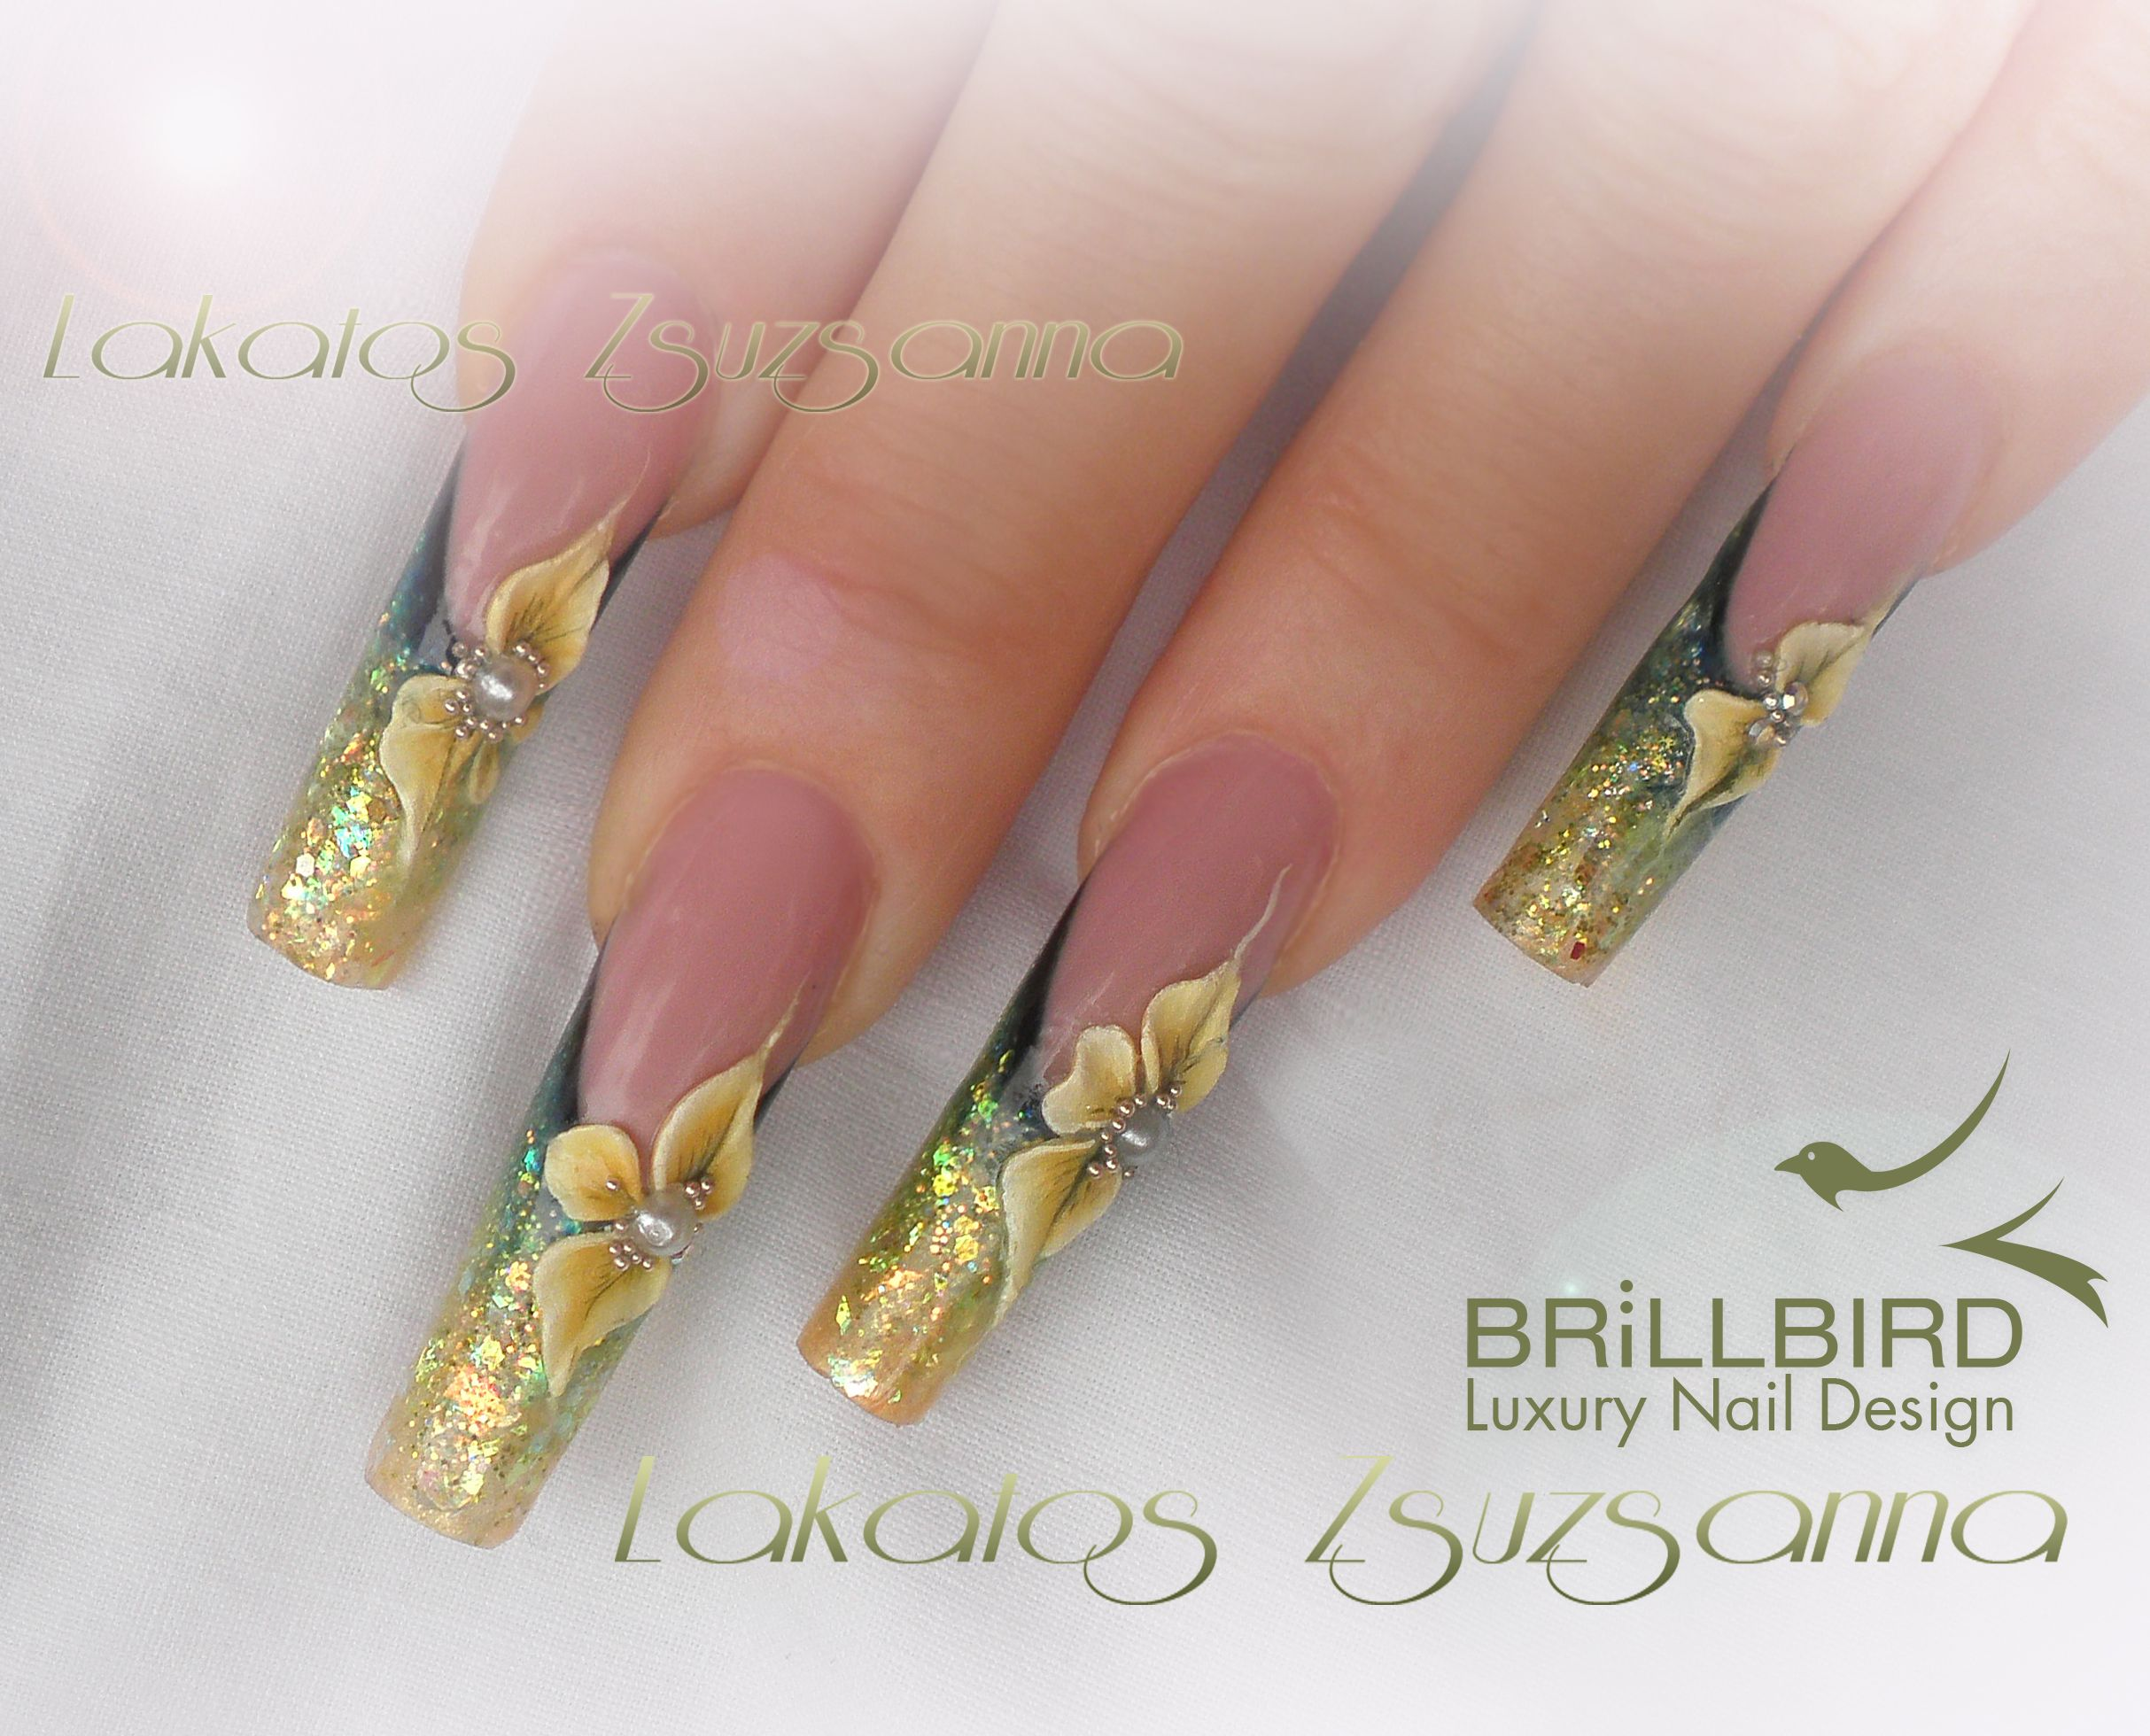 91 best BrillBird images on Pinterest | Nail design, Nail art ...